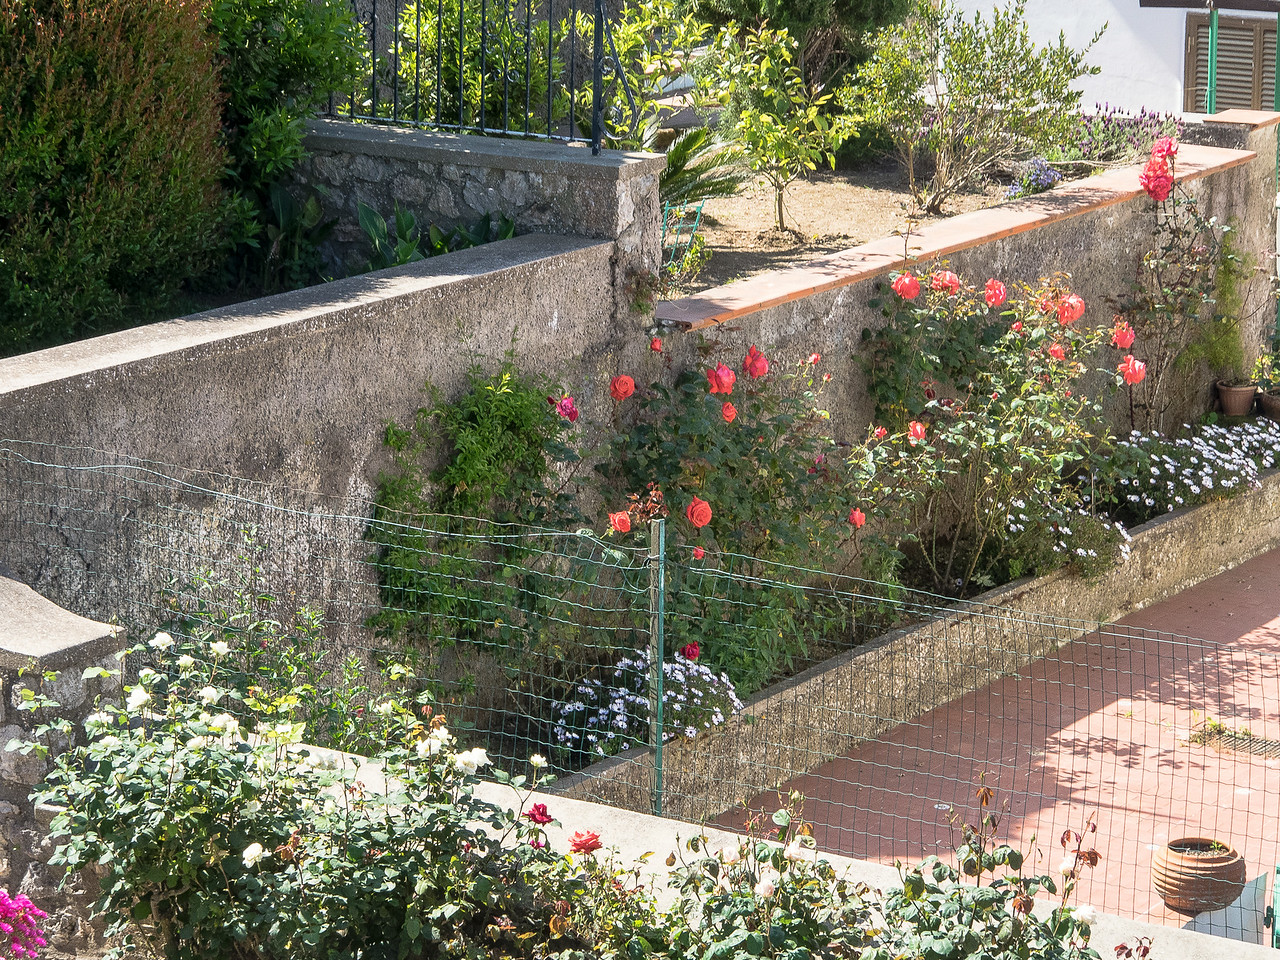 Capri - Garden from the Monte Solara lift